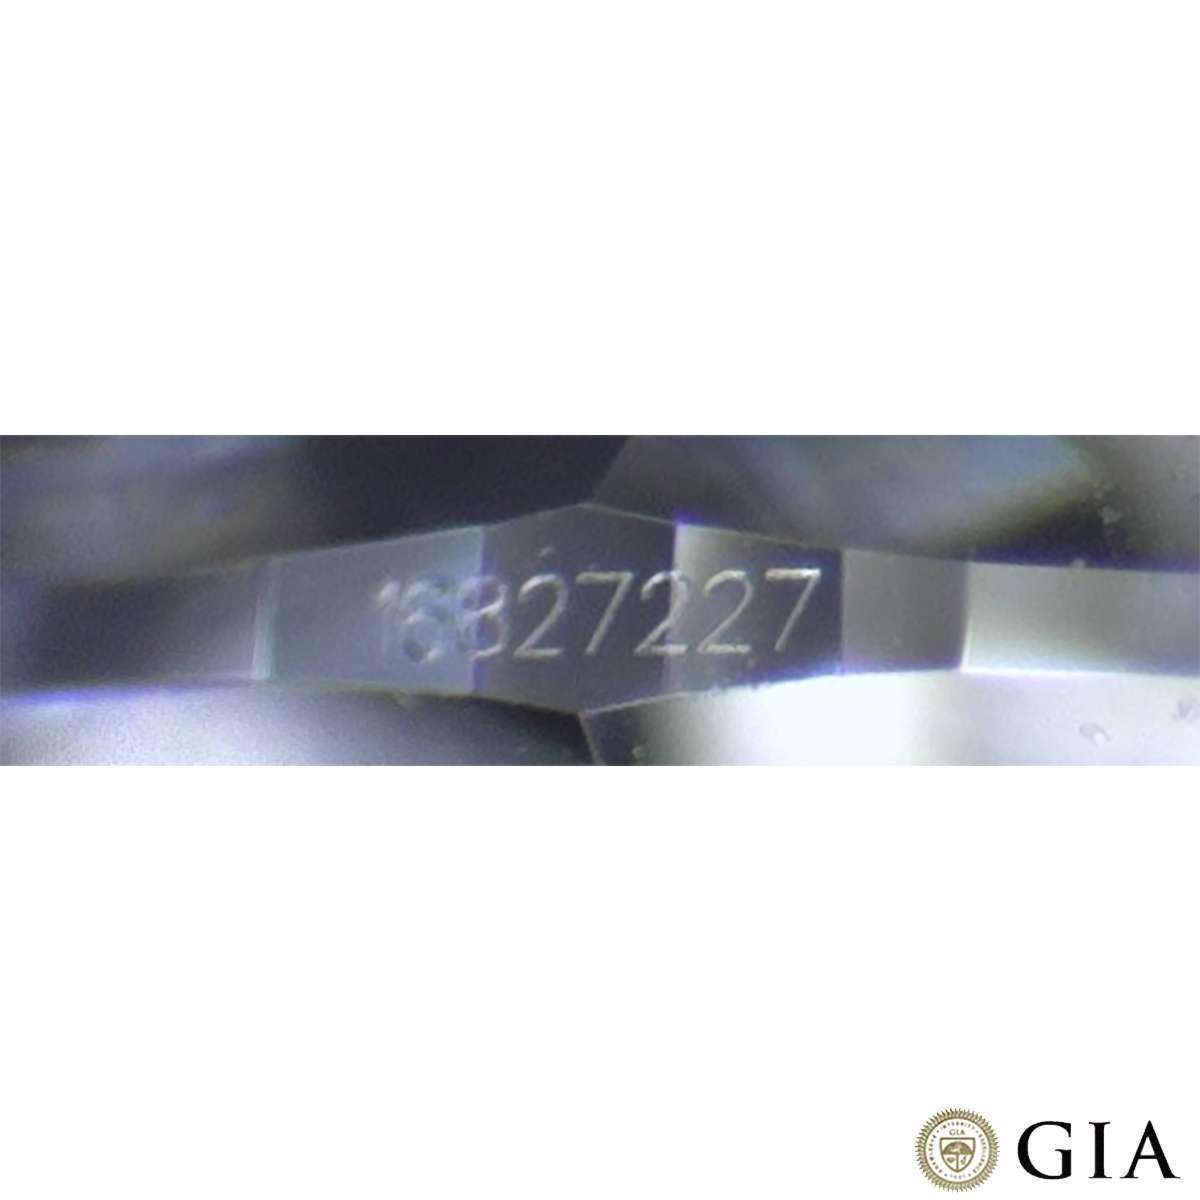 Round Brilliant Cut Diamond Platinum Ring 1.15ct D/VVS2 XXX